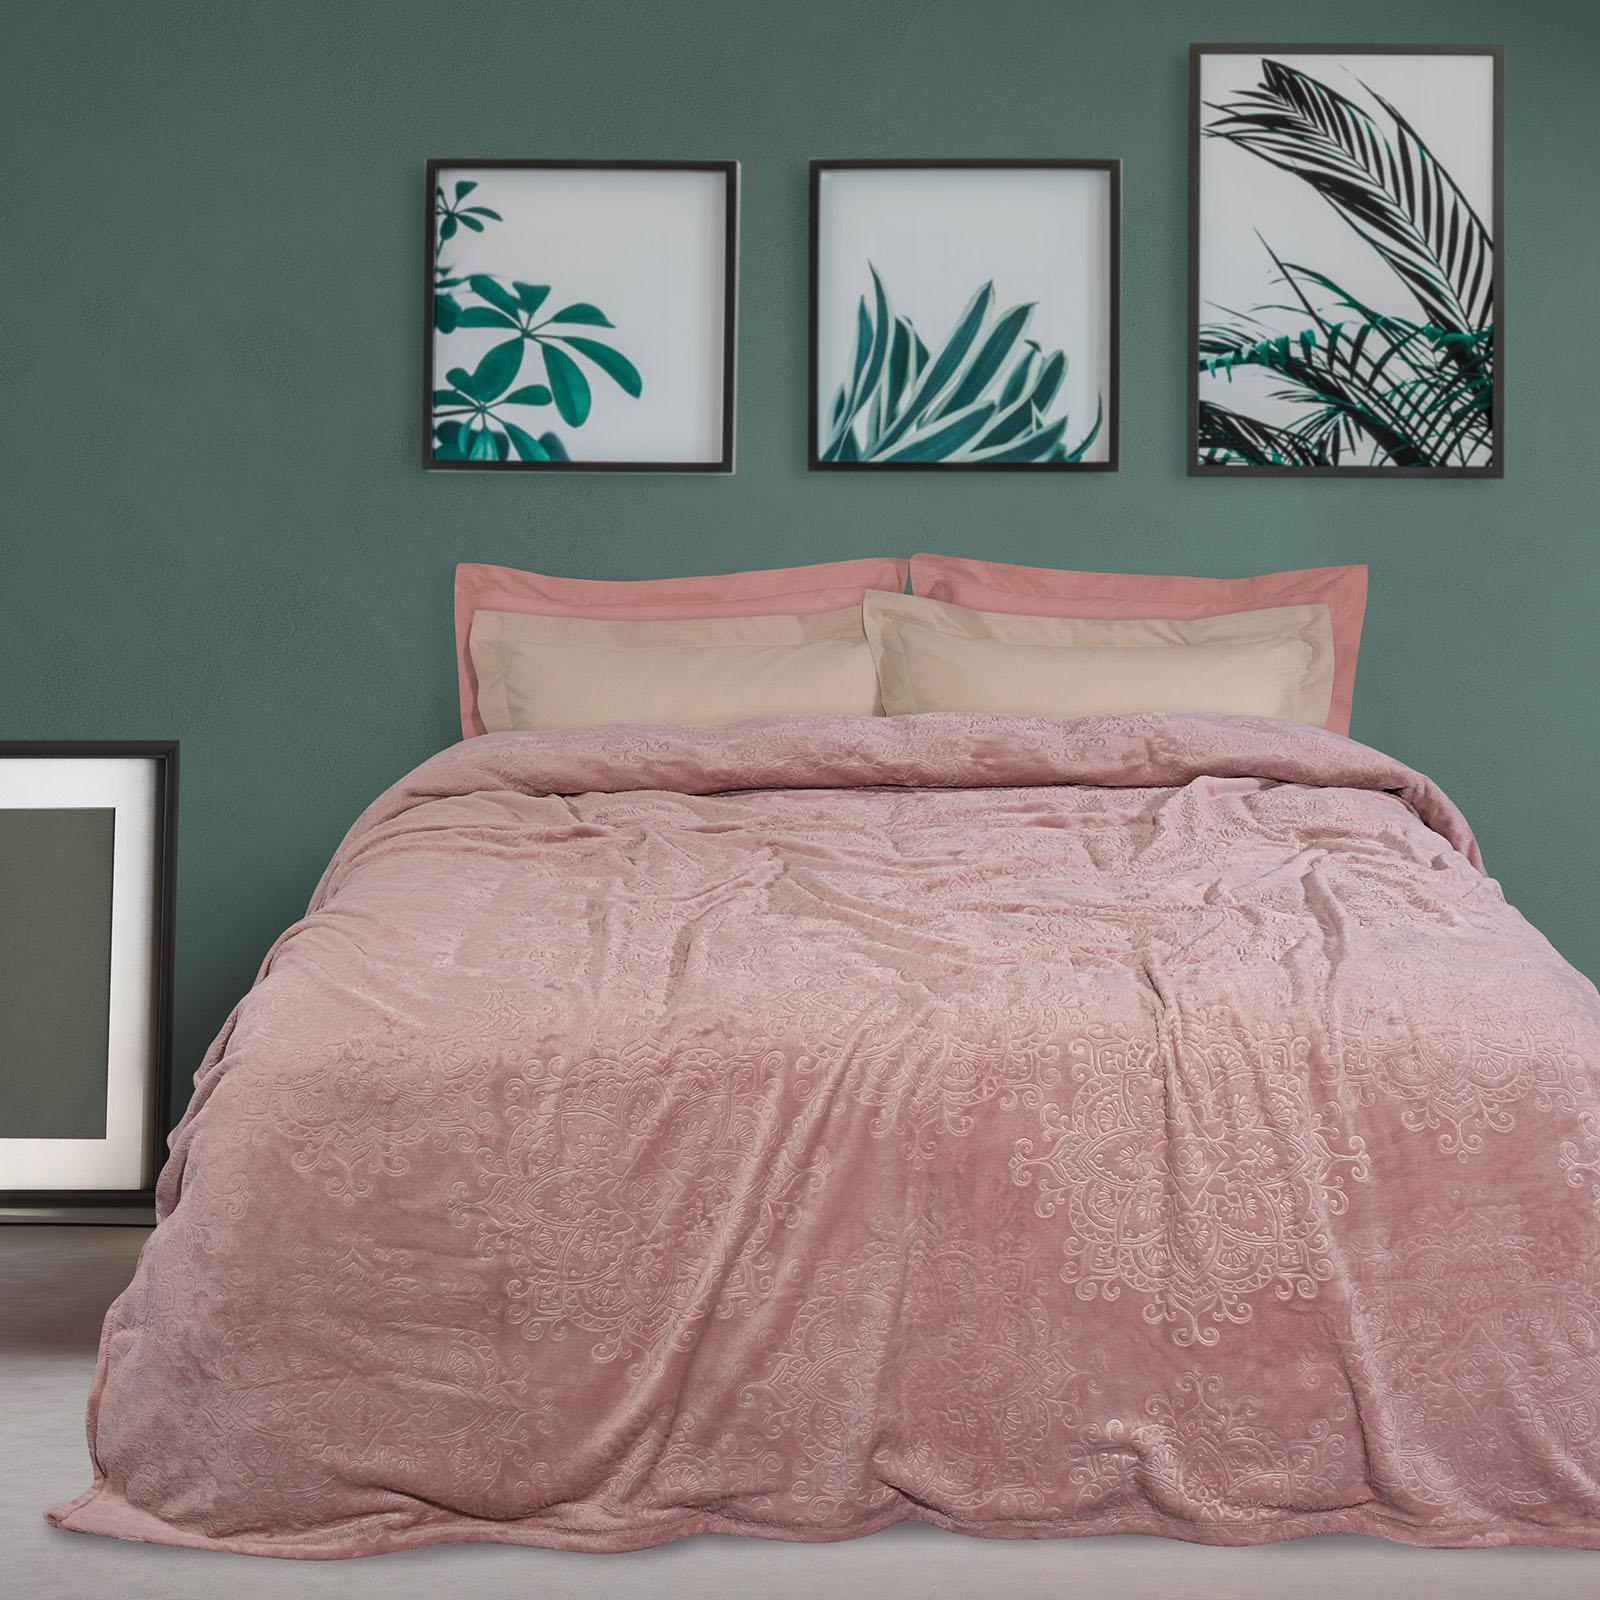 Das Home Κουβερτα Χειμωνιατικη Μονή 160×220 Nude 0453